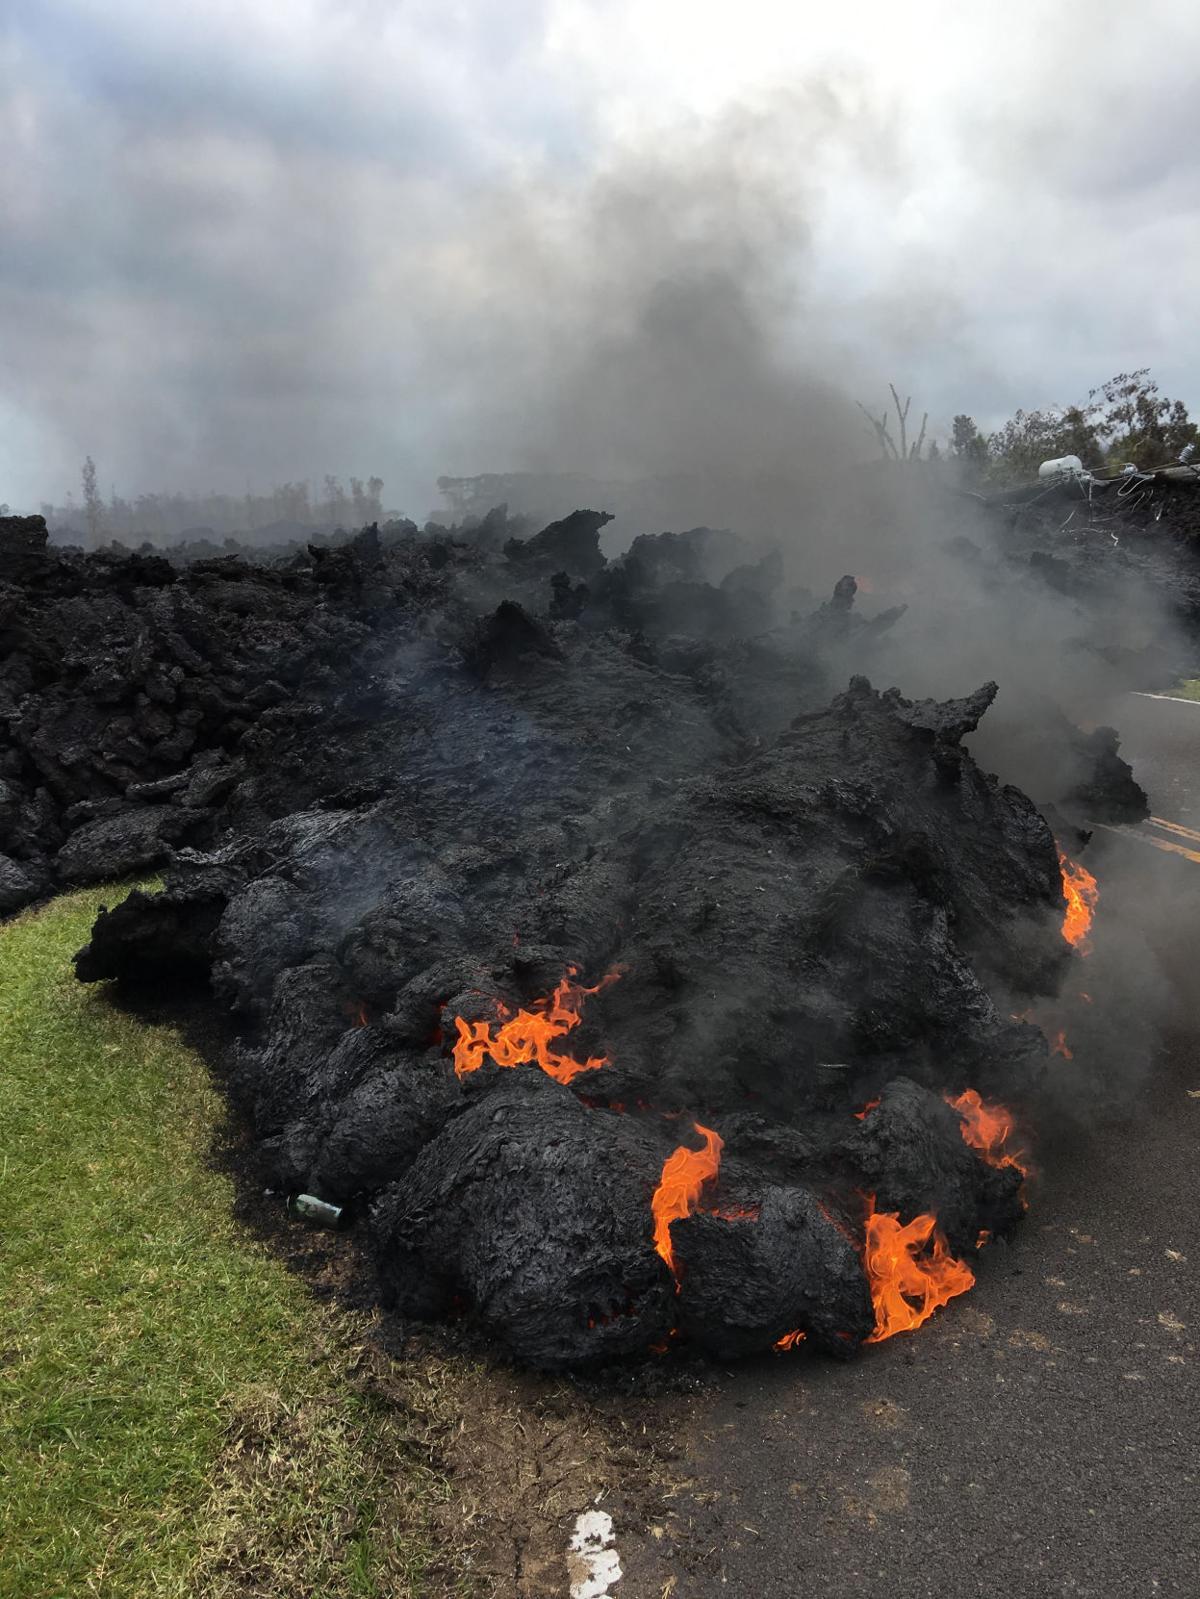 Hawaii braces for long upheaval as erupting Kilauea volcano boils